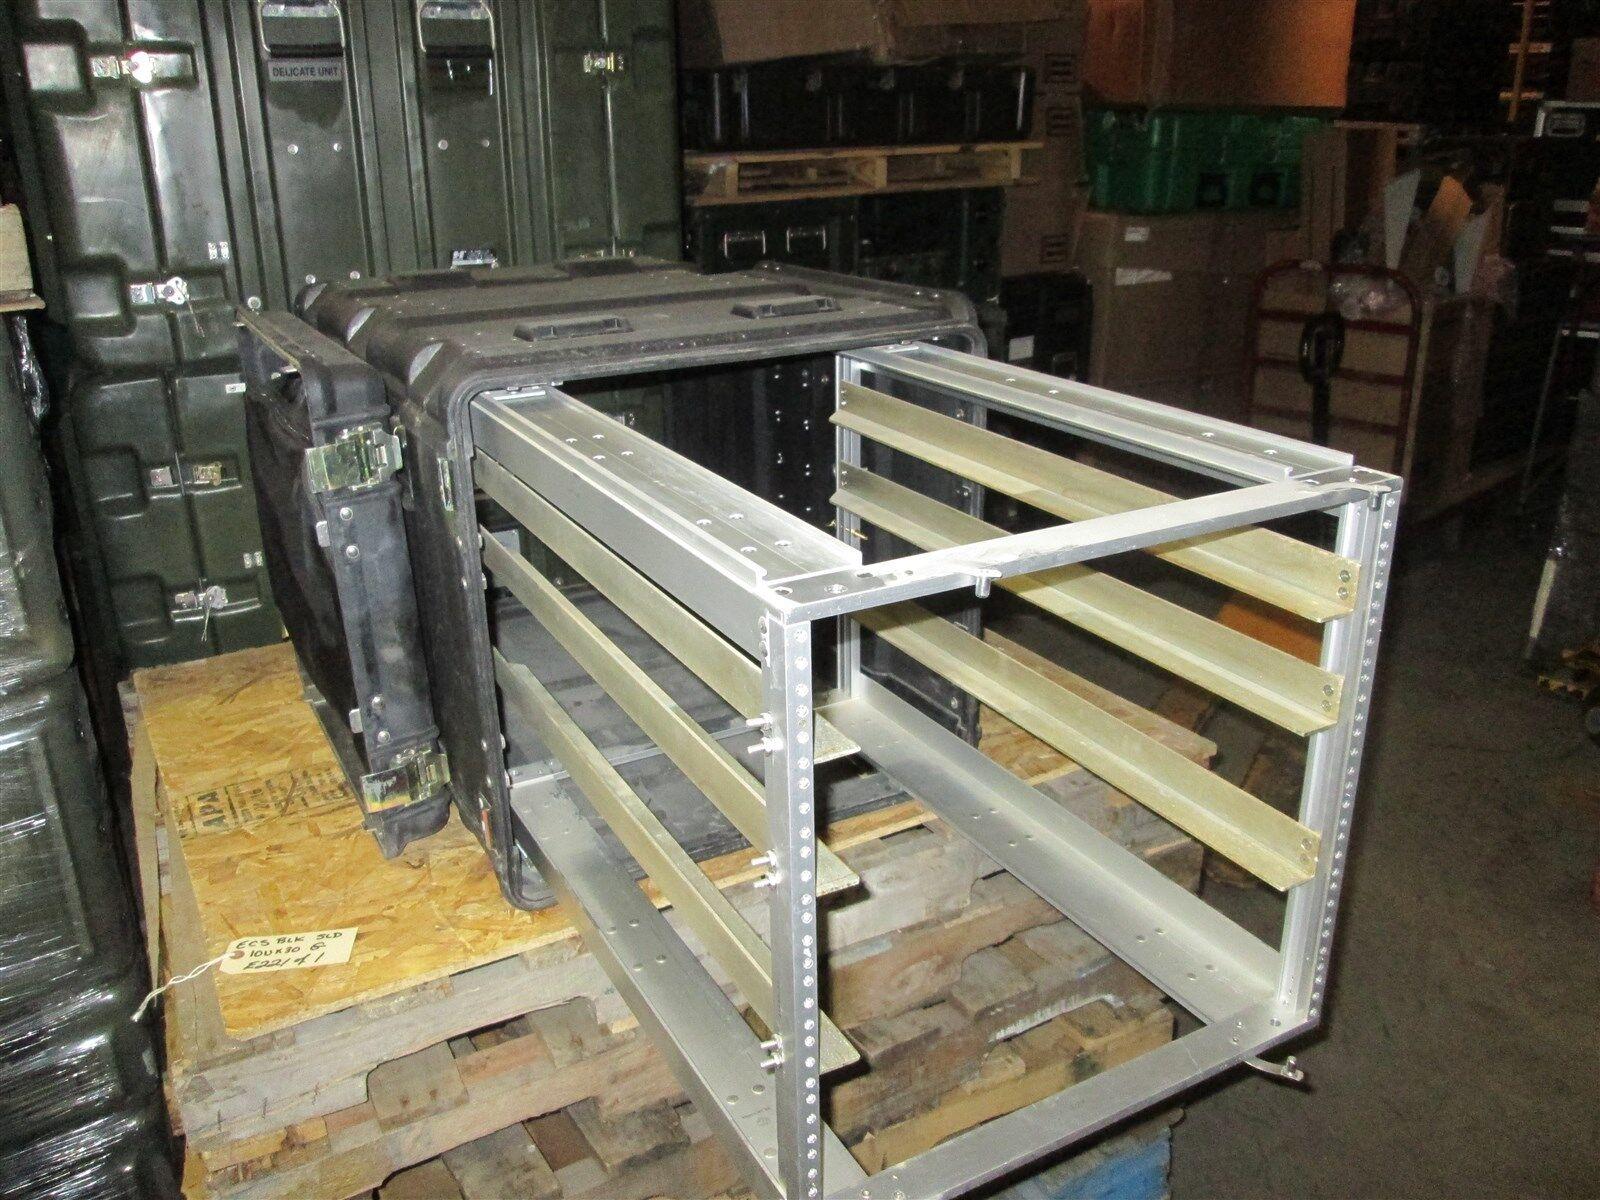 Rackmount 10U x30 Slide Out ECS Legacy Composite Shock Mount Shockmount Case Blk